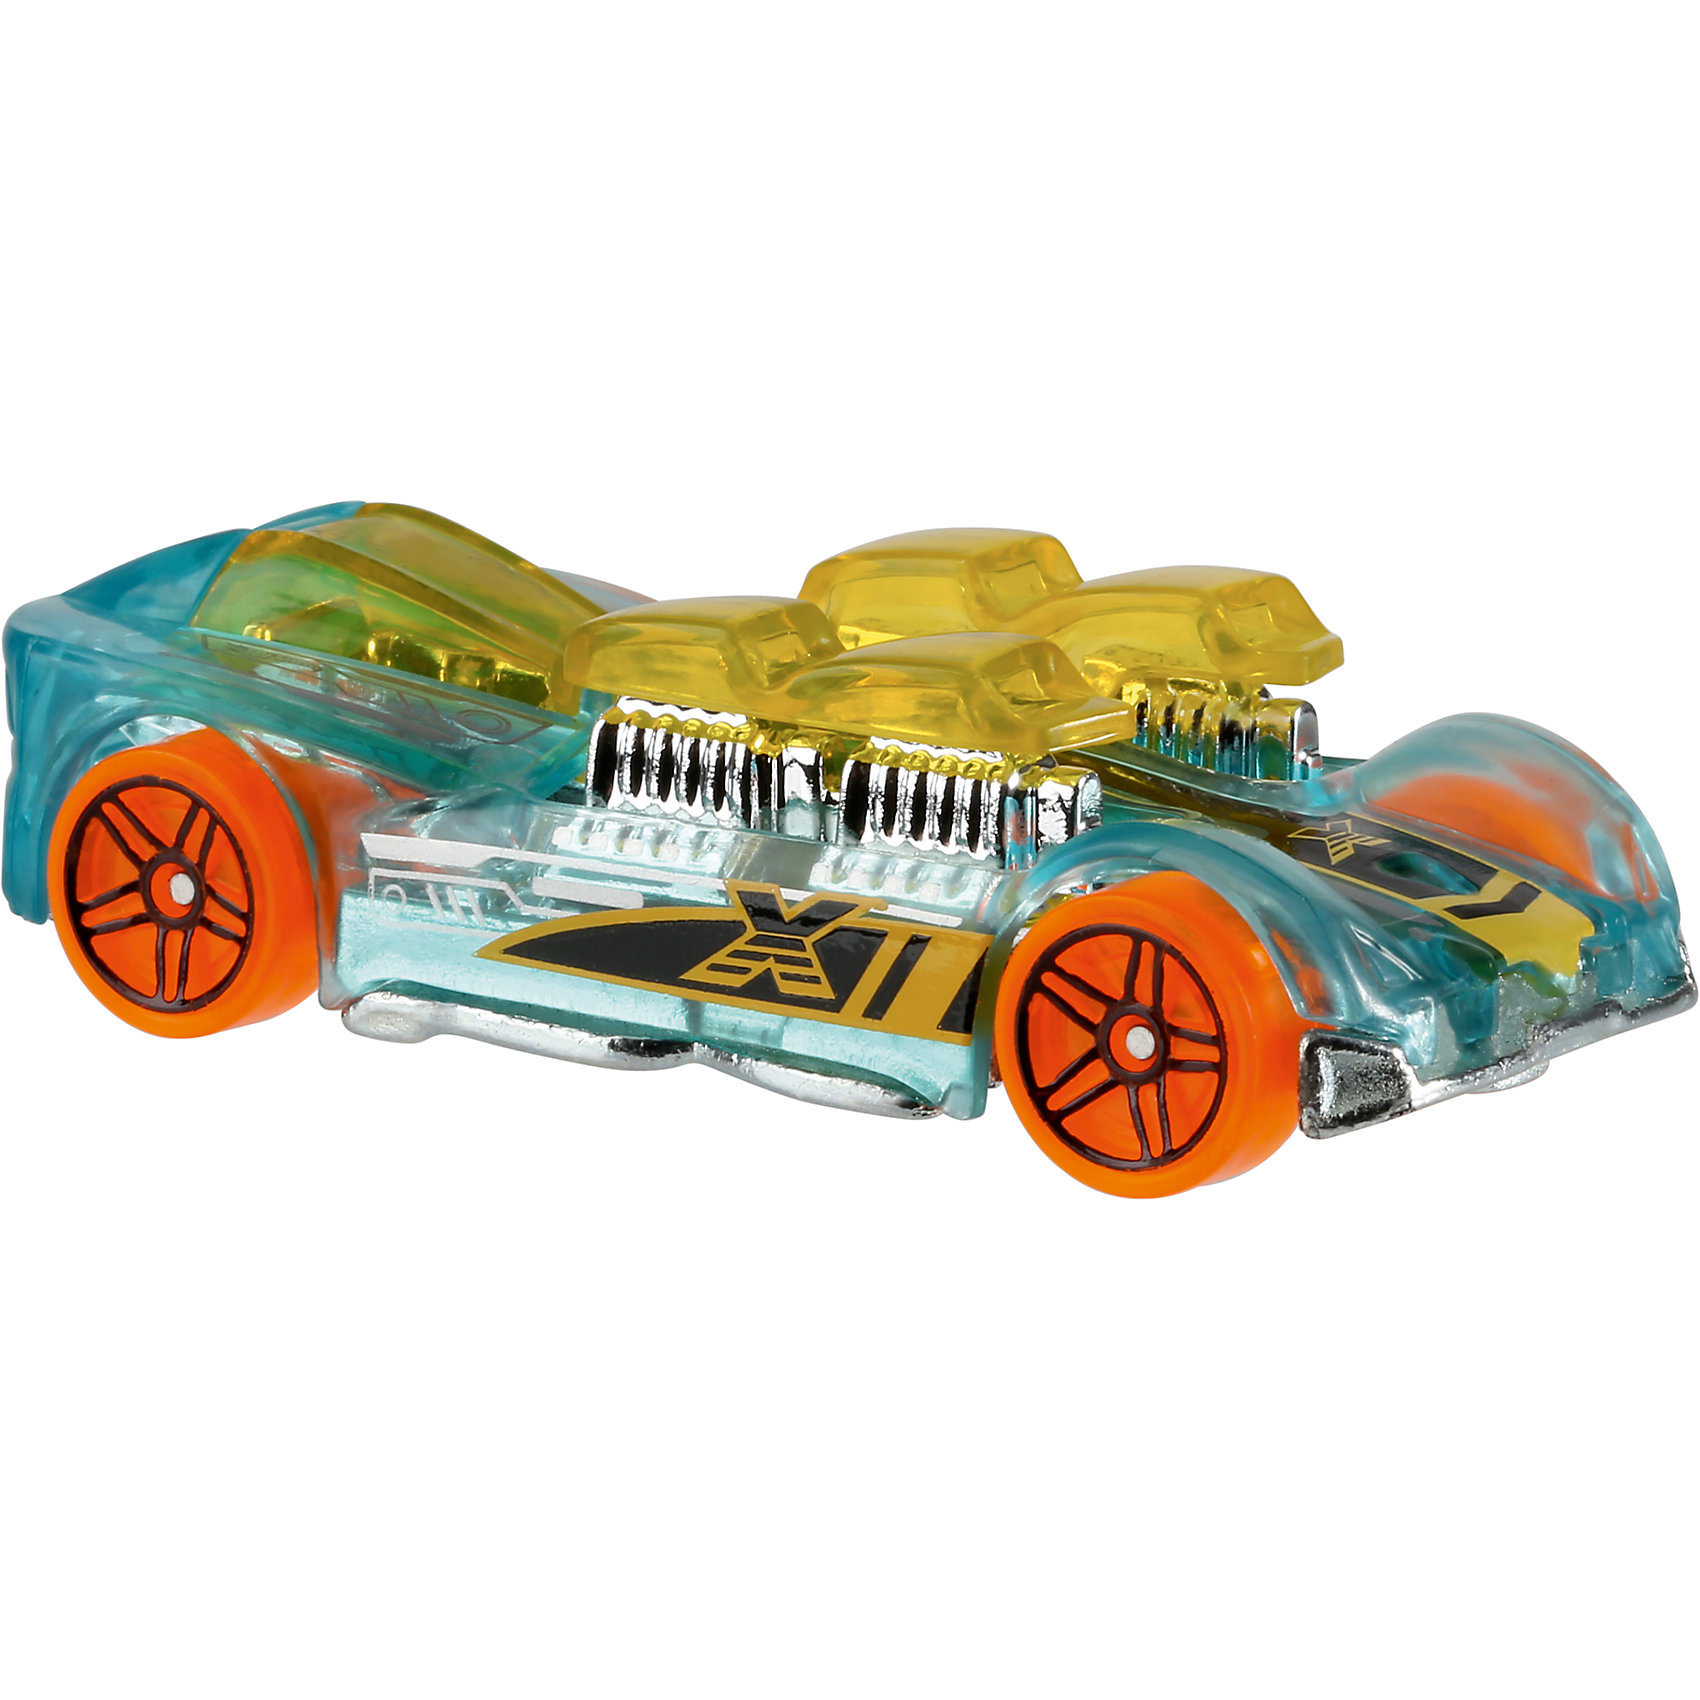 Базовая машинка Hot Wheels, What-4-2Популярные игрушки<br><br><br>Ширина мм: 110<br>Глубина мм: 45<br>Высота мм: 110<br>Вес г: 30<br>Возраст от месяцев: 36<br>Возраст до месяцев: 96<br>Пол: Мужской<br>Возраст: Детский<br>SKU: 7111104